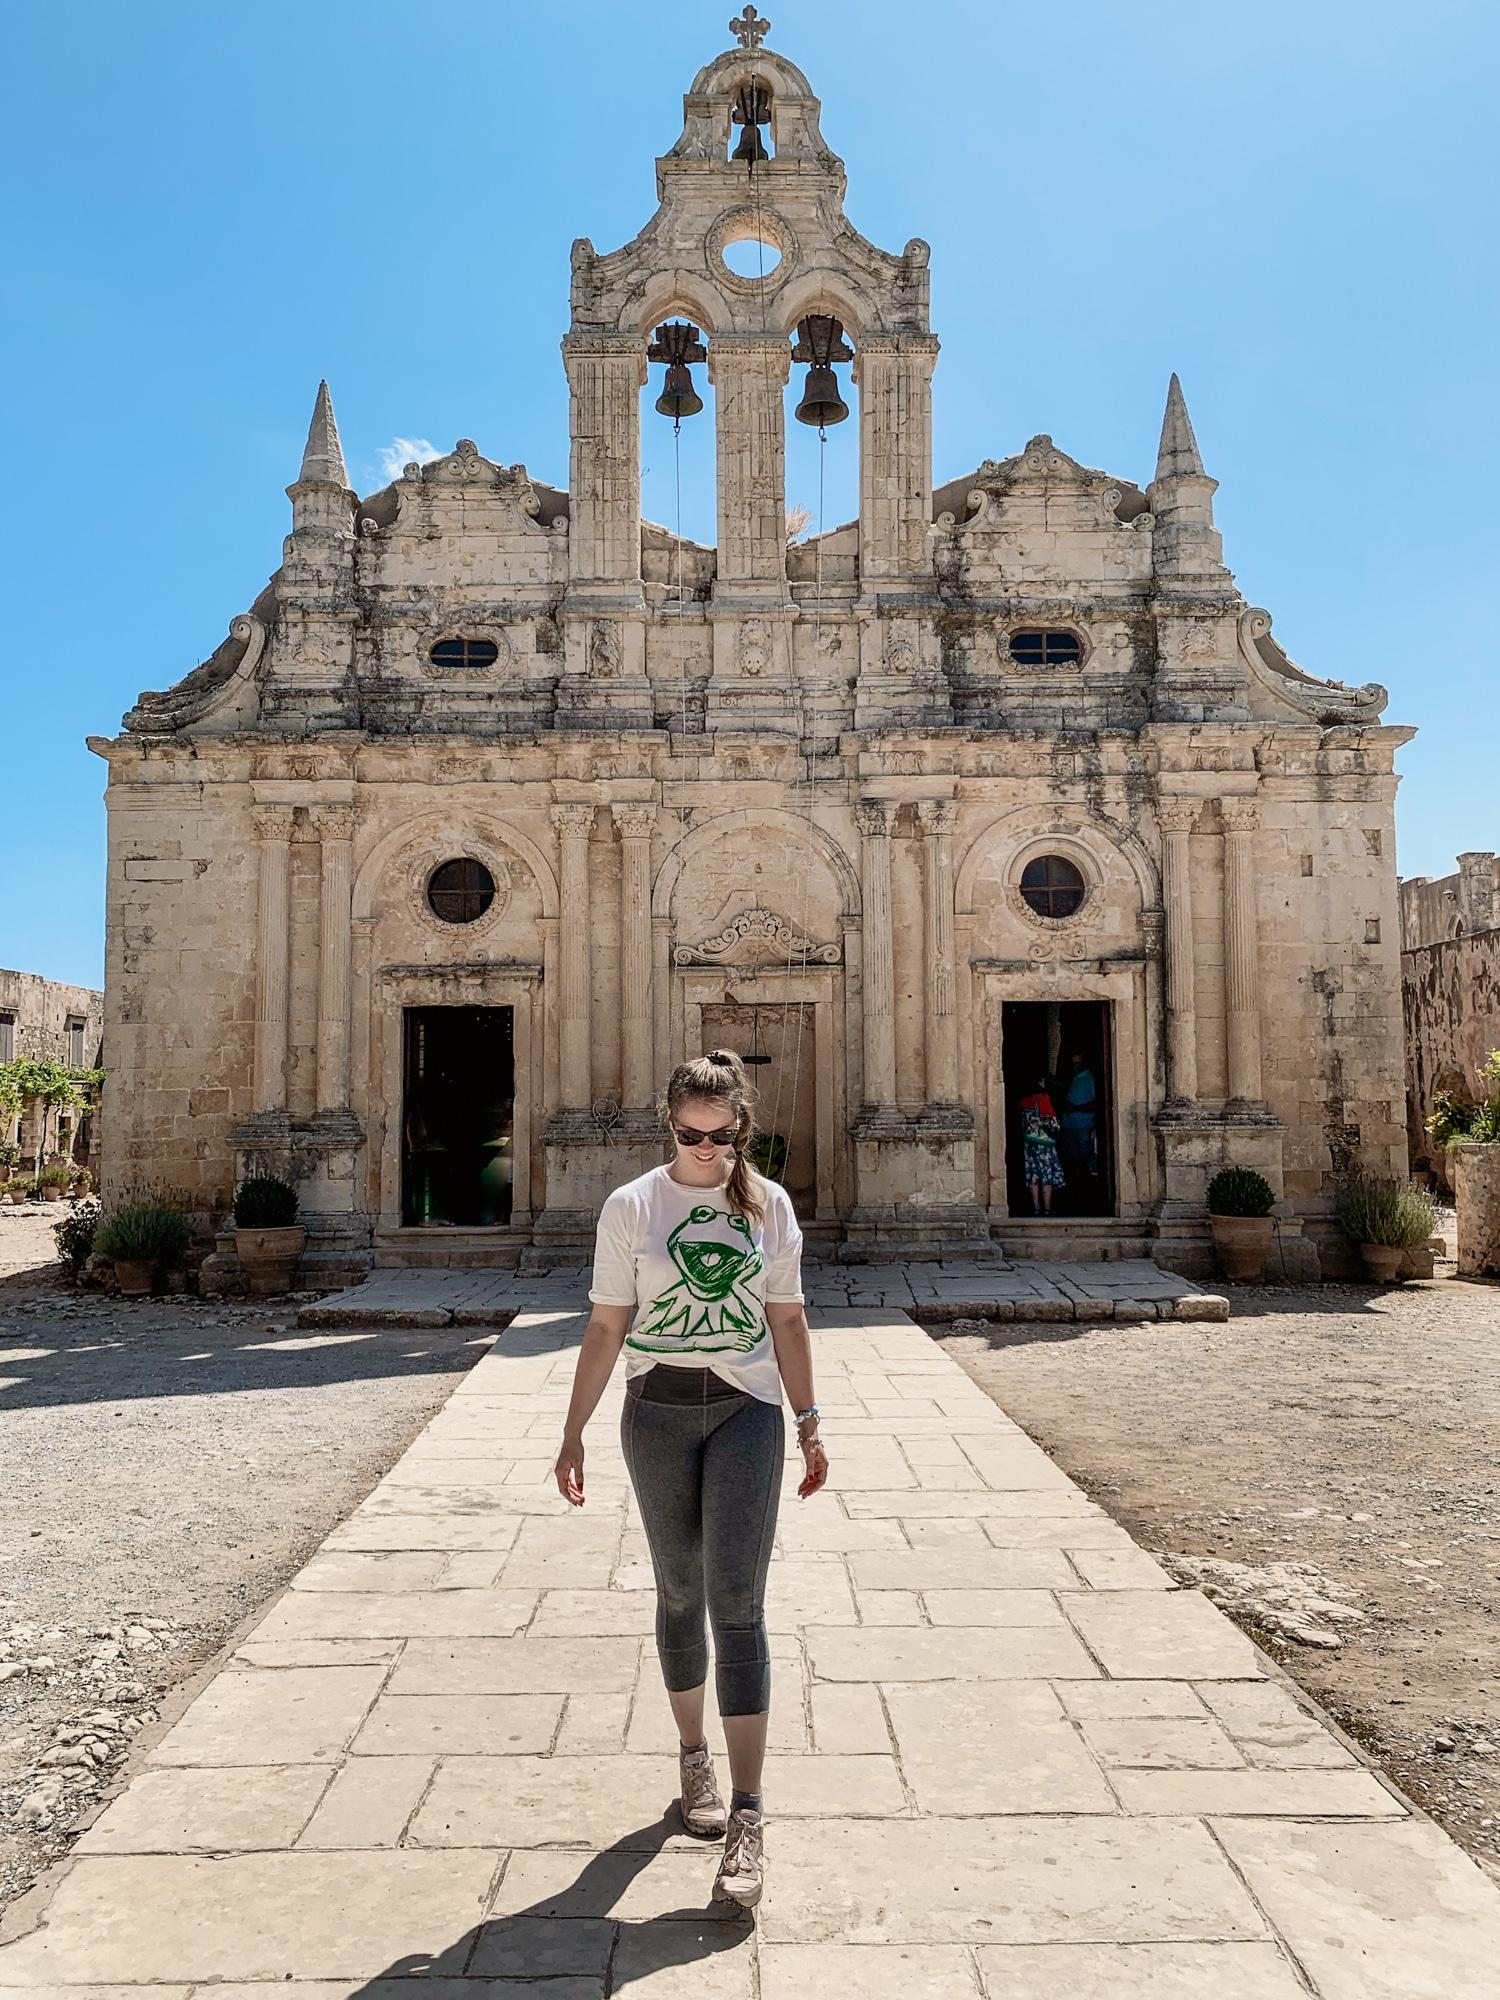 Kreta Rundreise Highlights und Tipps - Kloster Arkadi